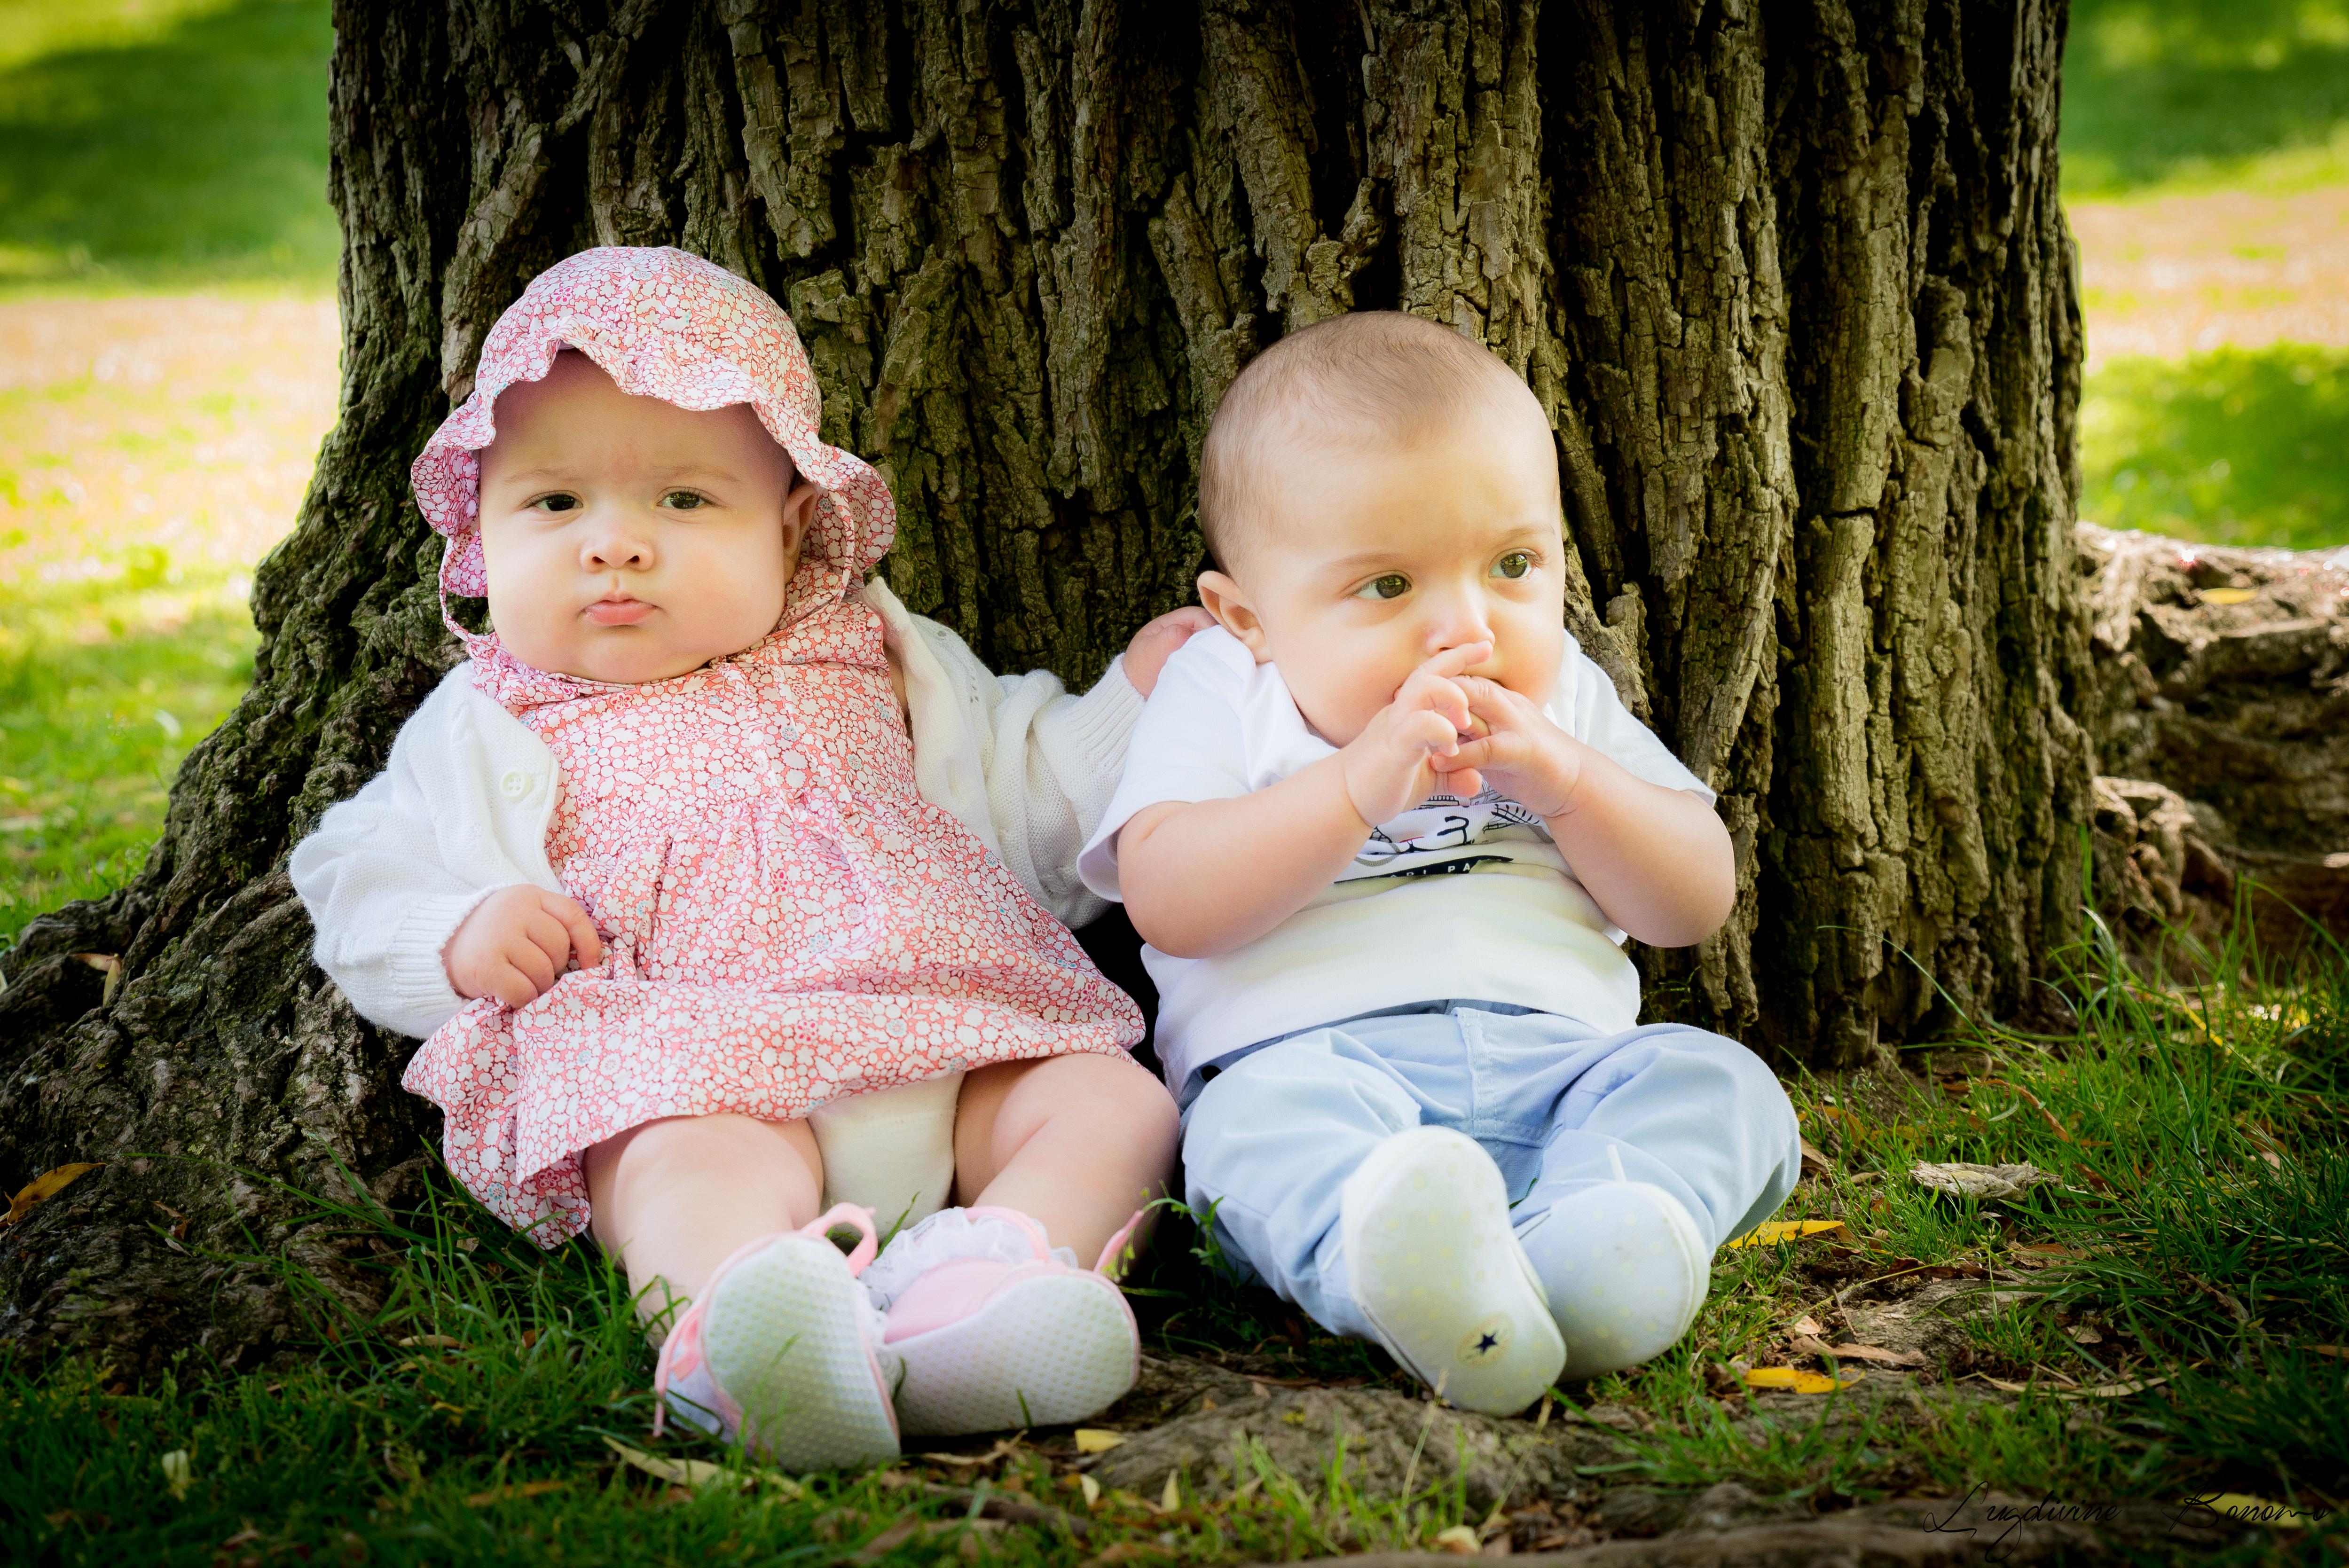 séance photo bébé 6 mois jardin